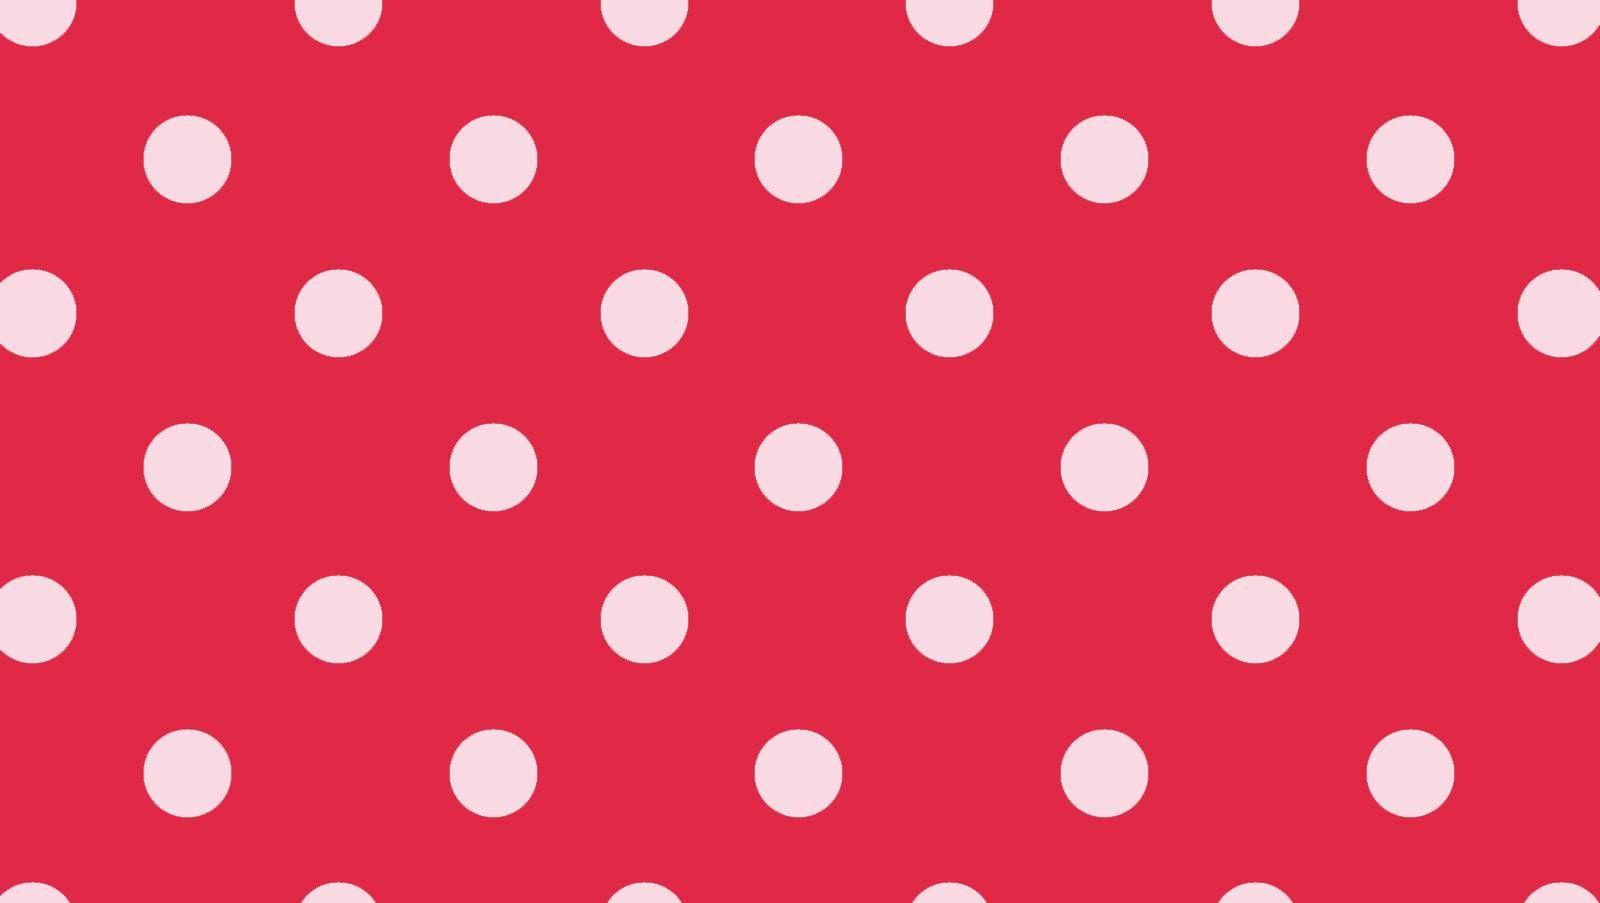 dots wallpaper hd impremedianet